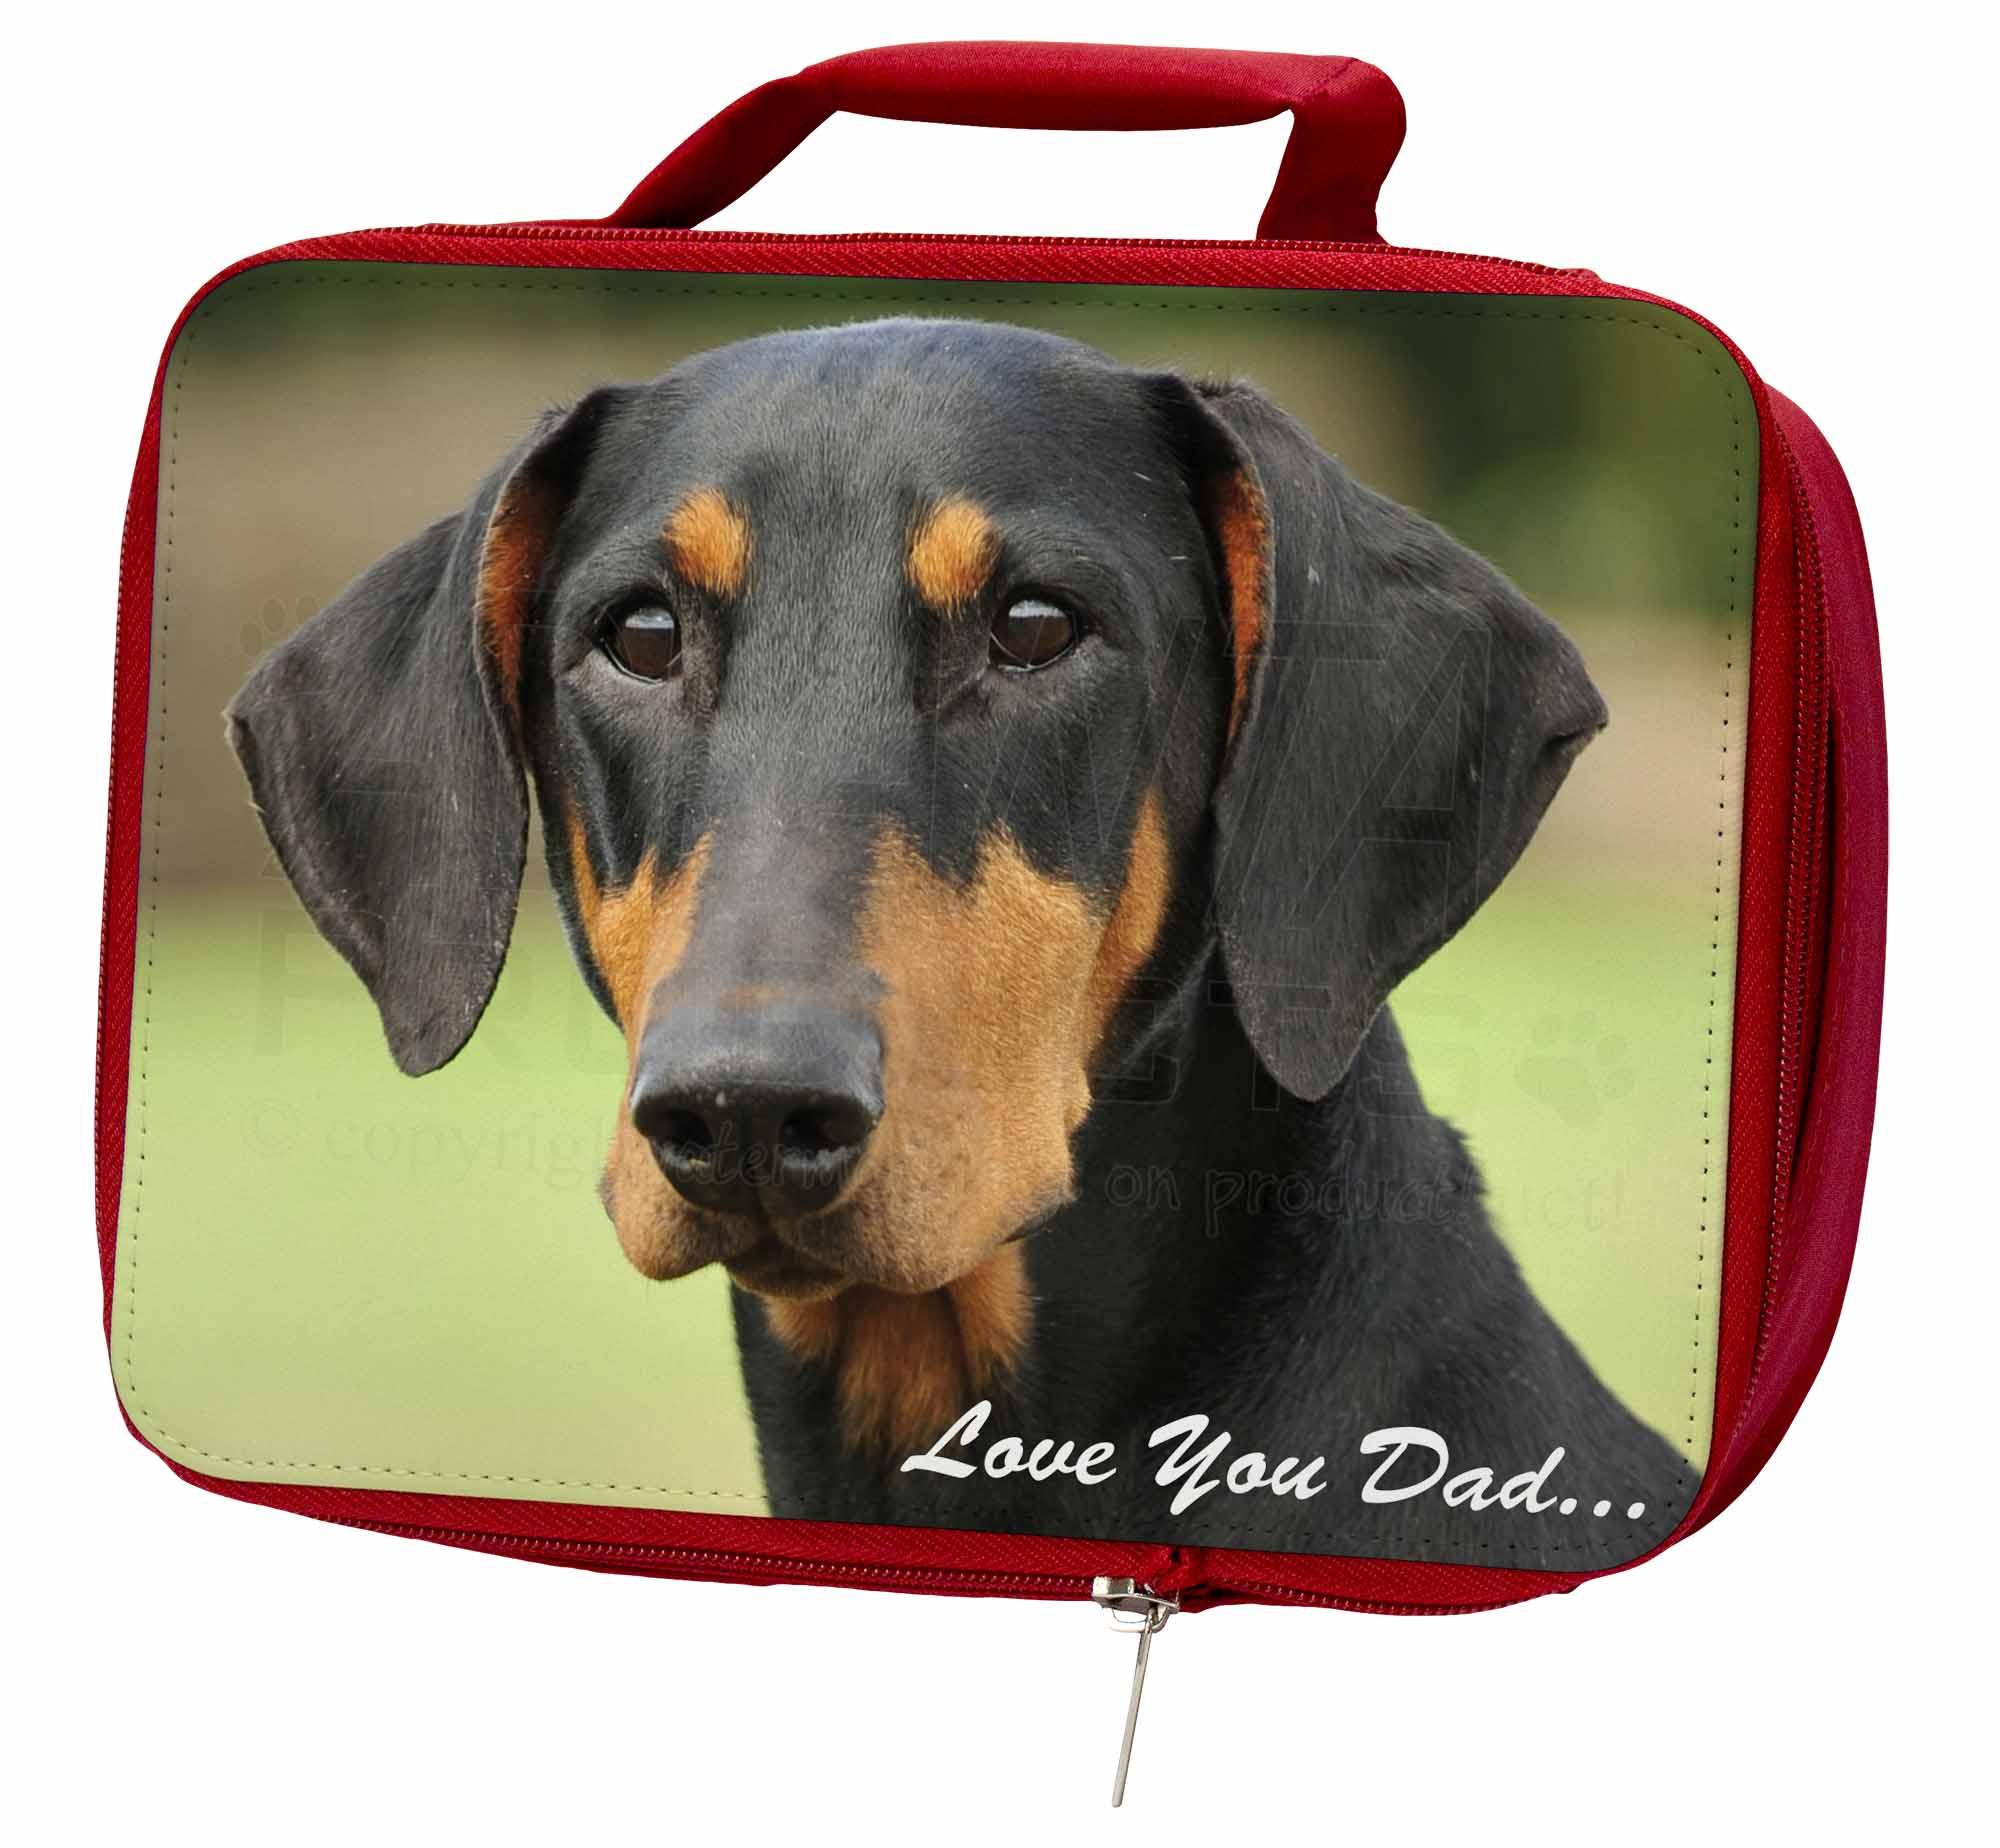 Doberman School Pinscher 'Love You Dad' Insulated Red School Doberman Lunch Box/Picni, DAD-21LBR d3ad74